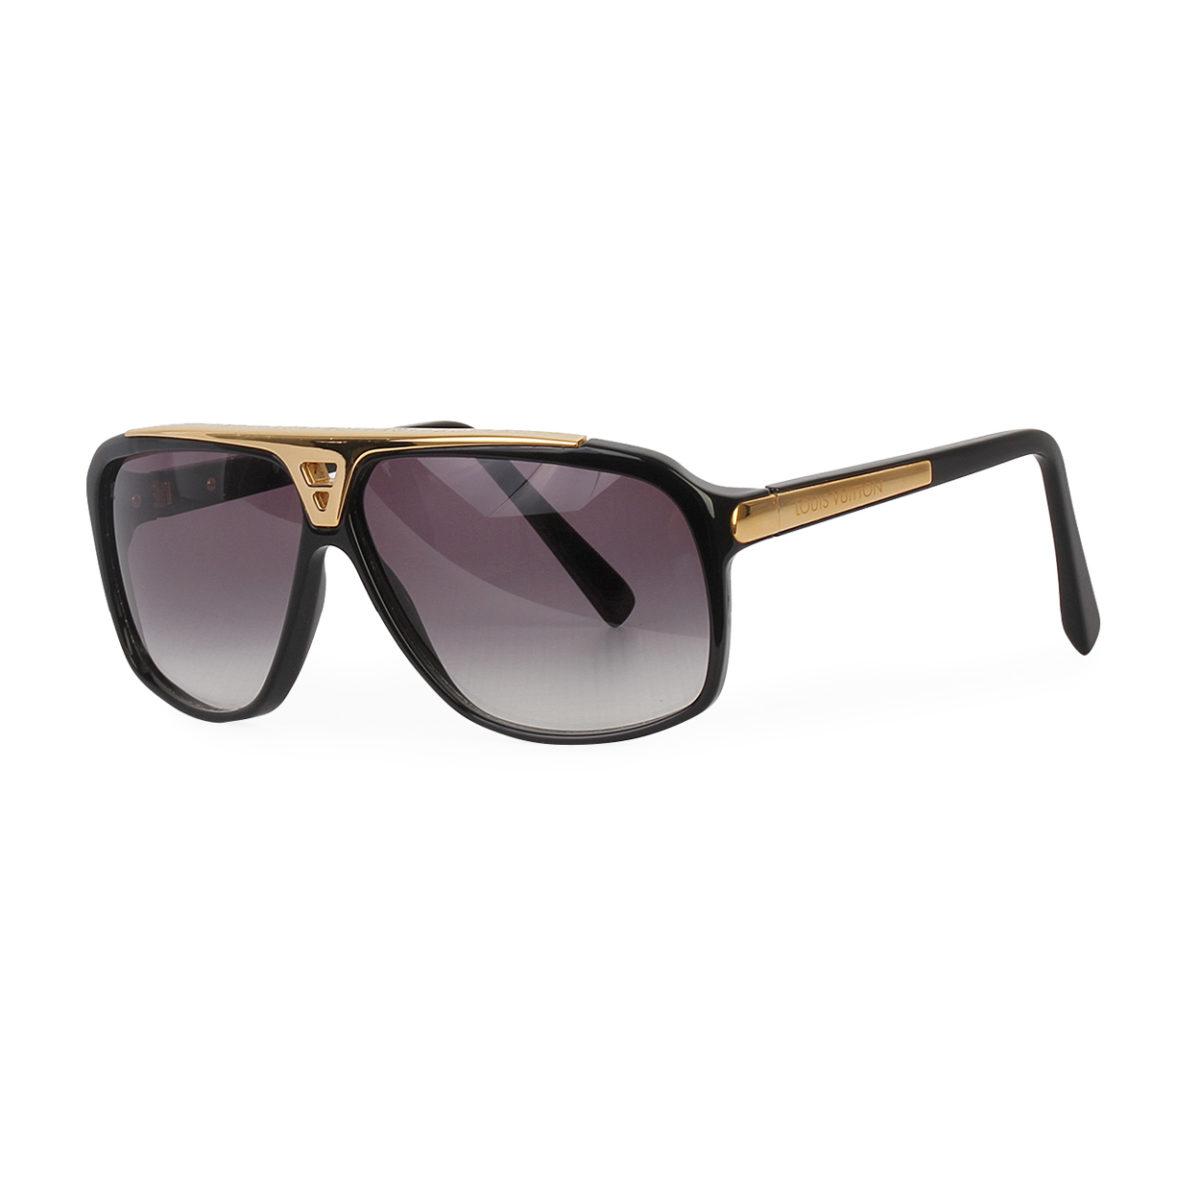 11708ea08b74a LOUIS VUITTON Evidence Sunglasses Z0350W Black Gold